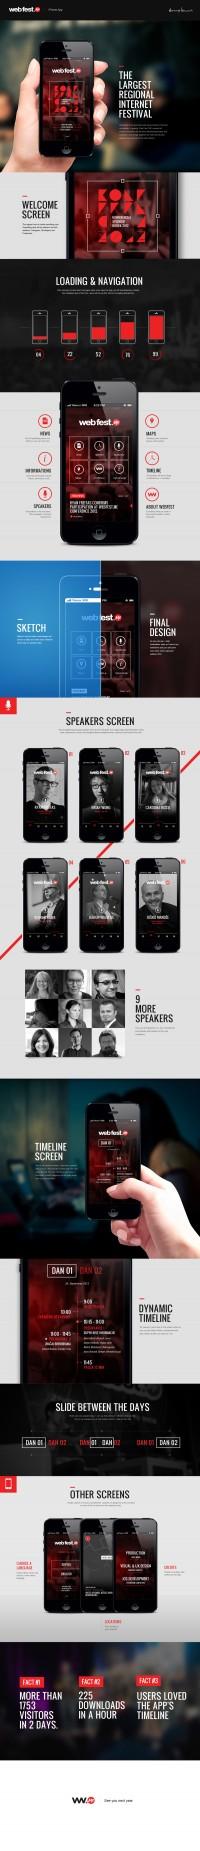 WebFest iPhone App